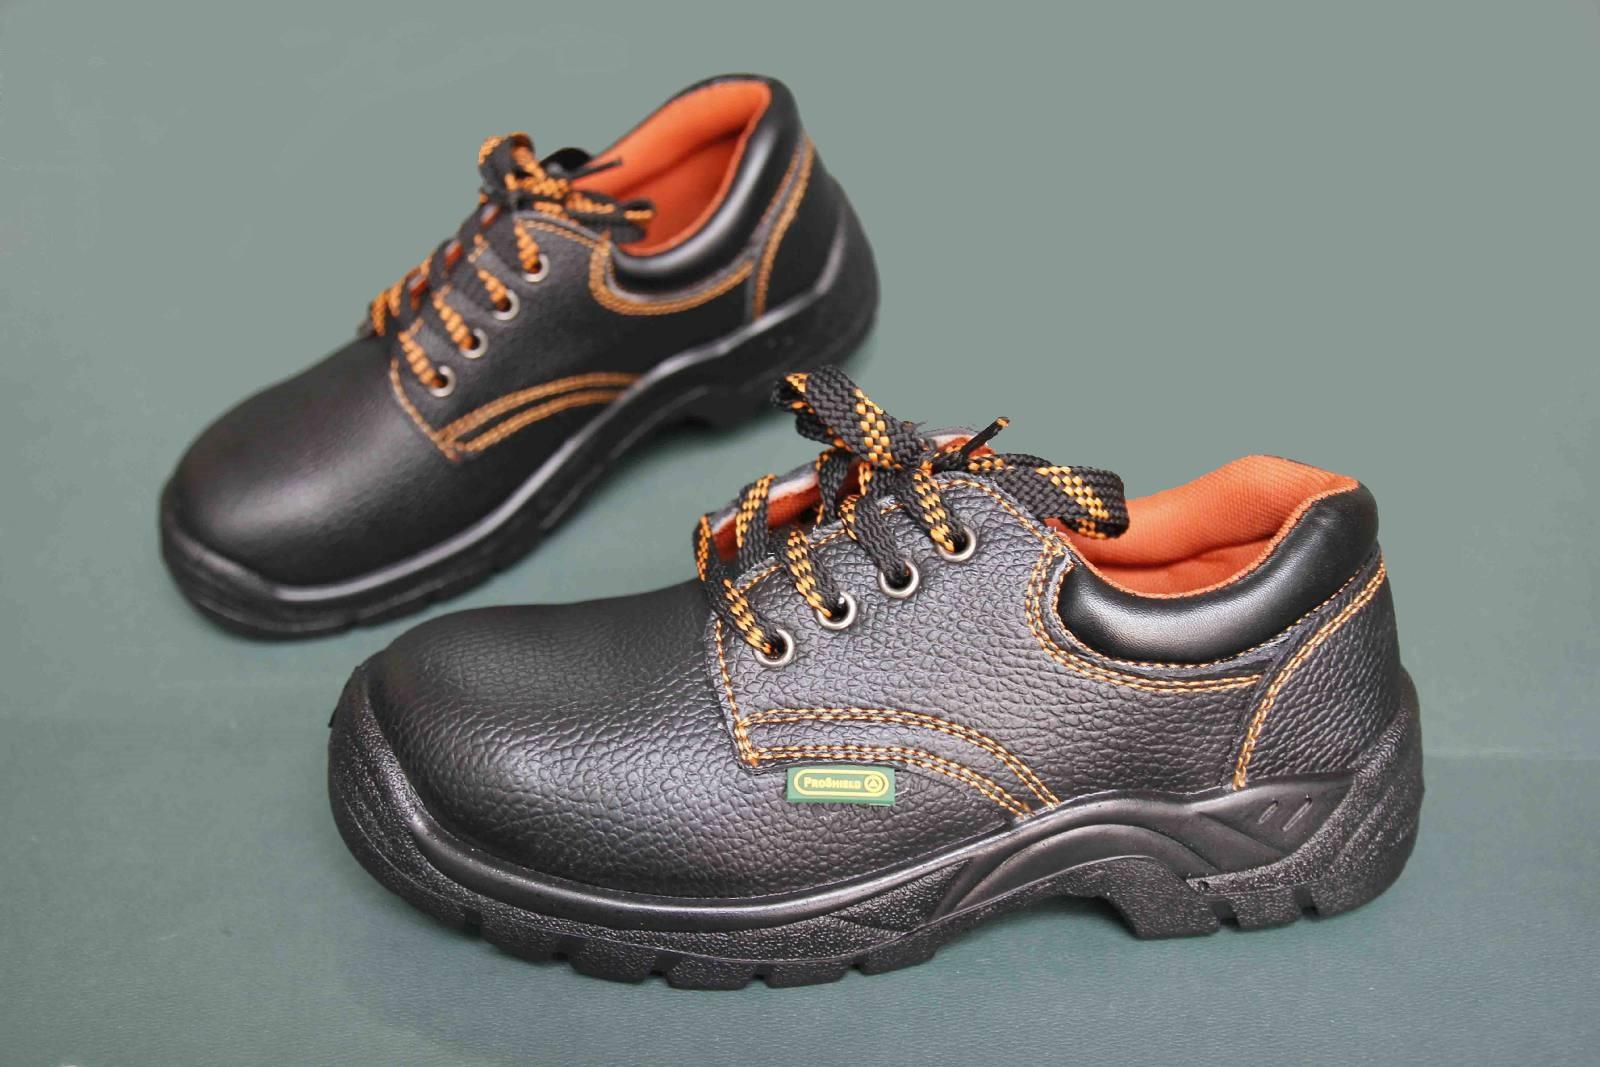 Giày bảo hộ mũi sắt GD-PRS01 Proshield